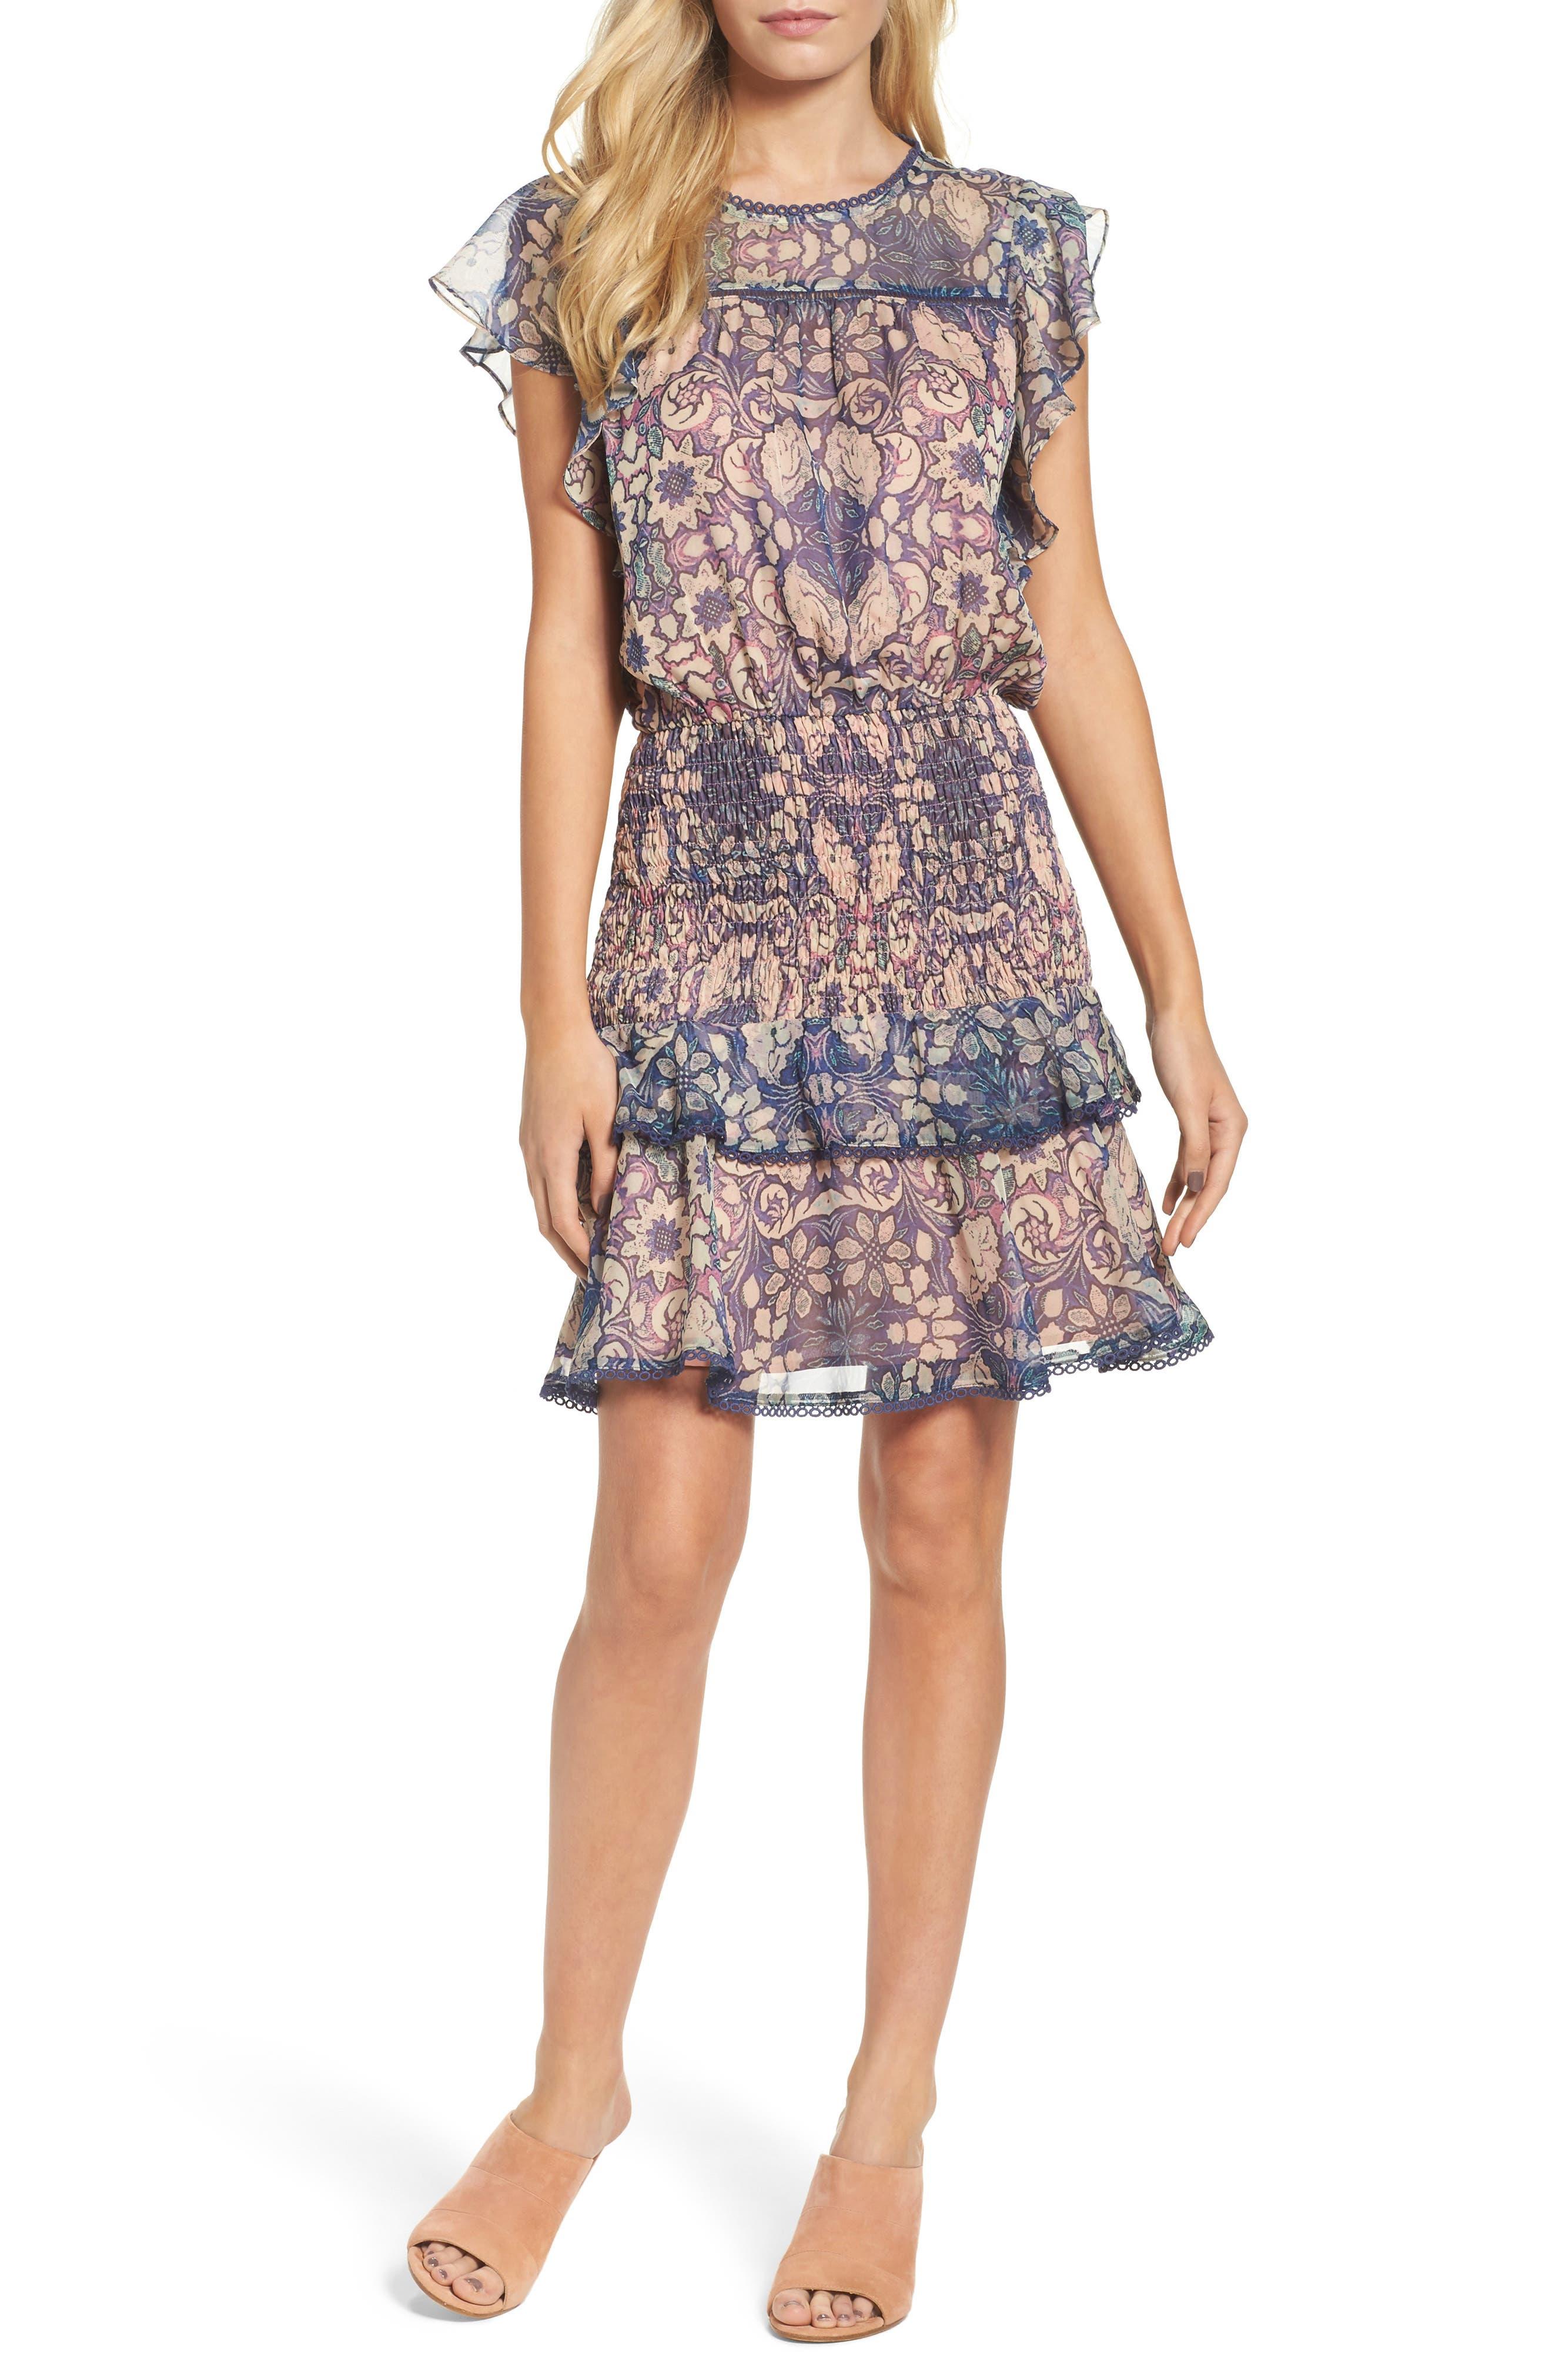 Alternate Image 1 Selected - Chelsea28 Tiered Blouson Dress